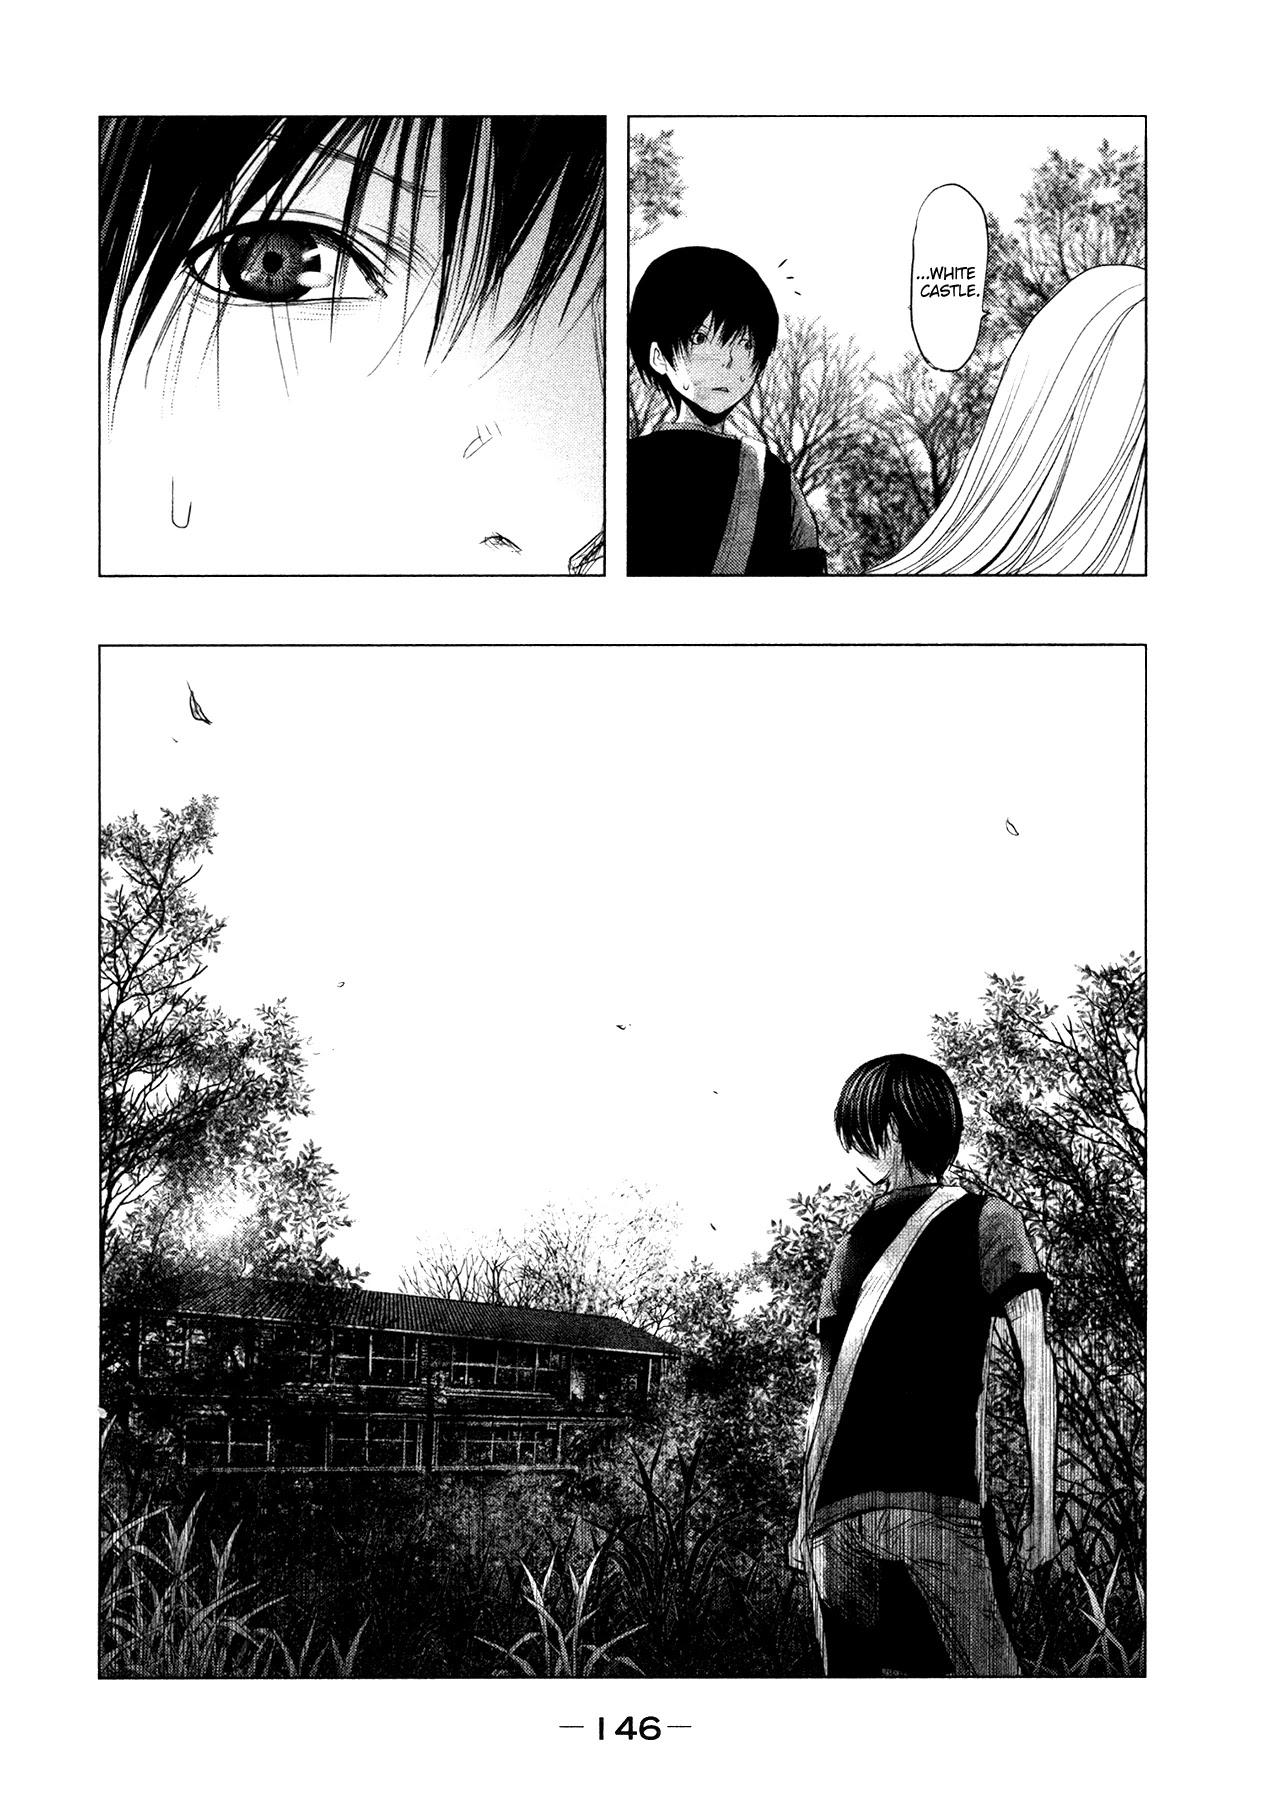 Kasouba No Nai Machi Ni Kane Ga Naru Toki Chapter 93: Let's Leave Mitozu page 15 - Mangakakalots.com